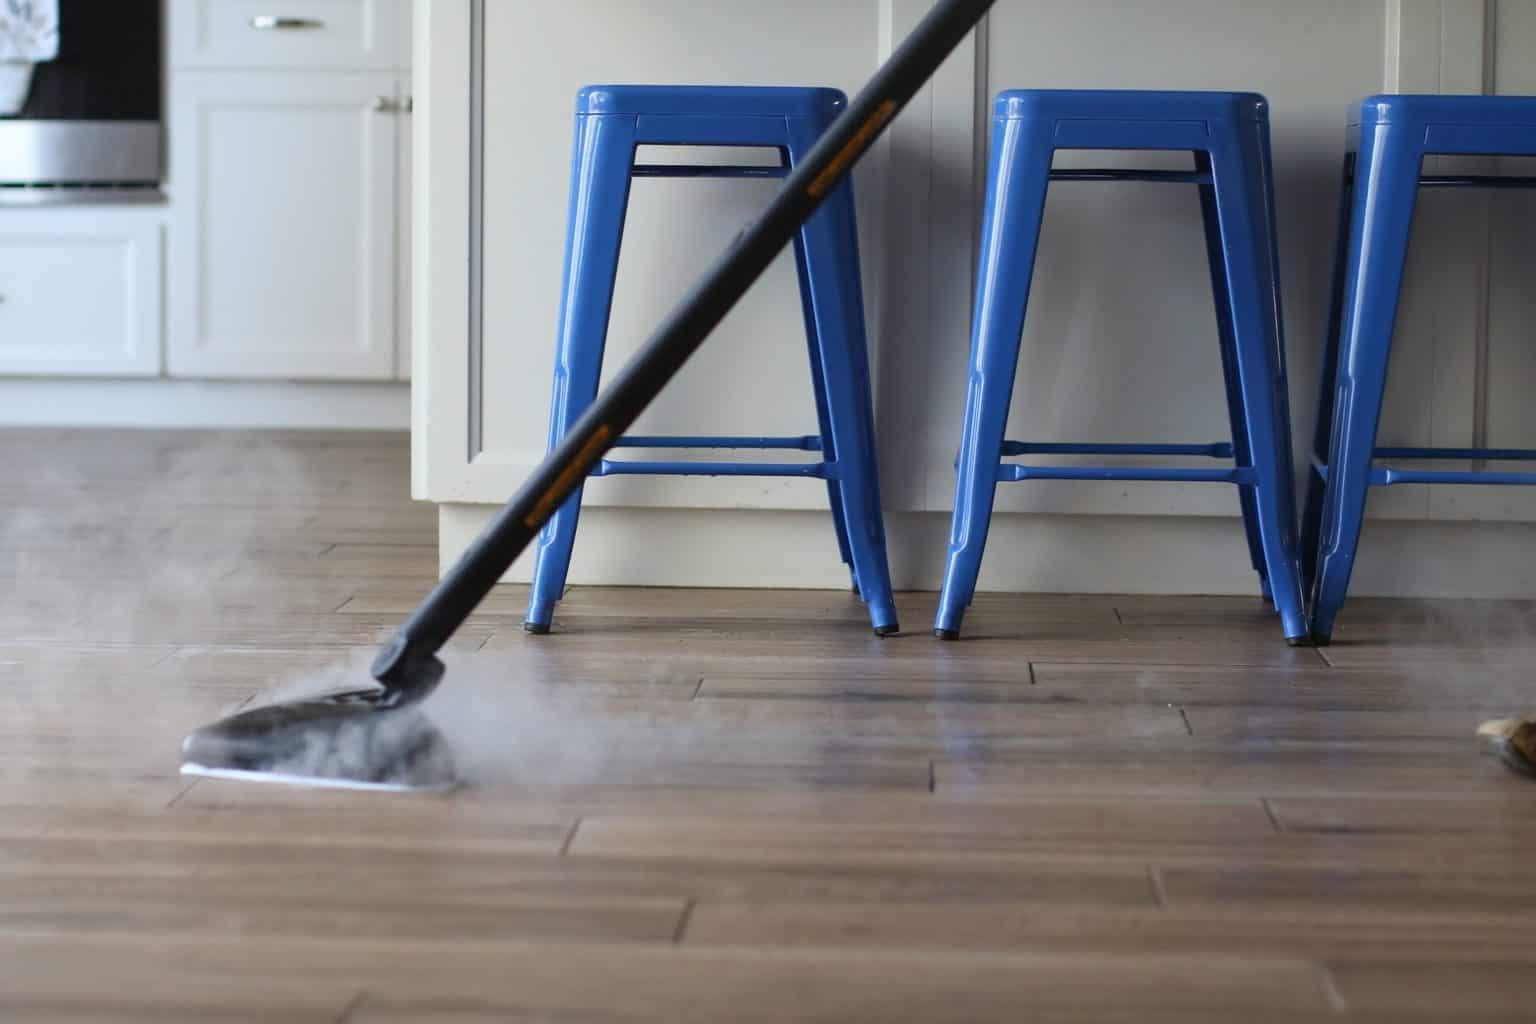 Steam mop cleaning a wooden floor